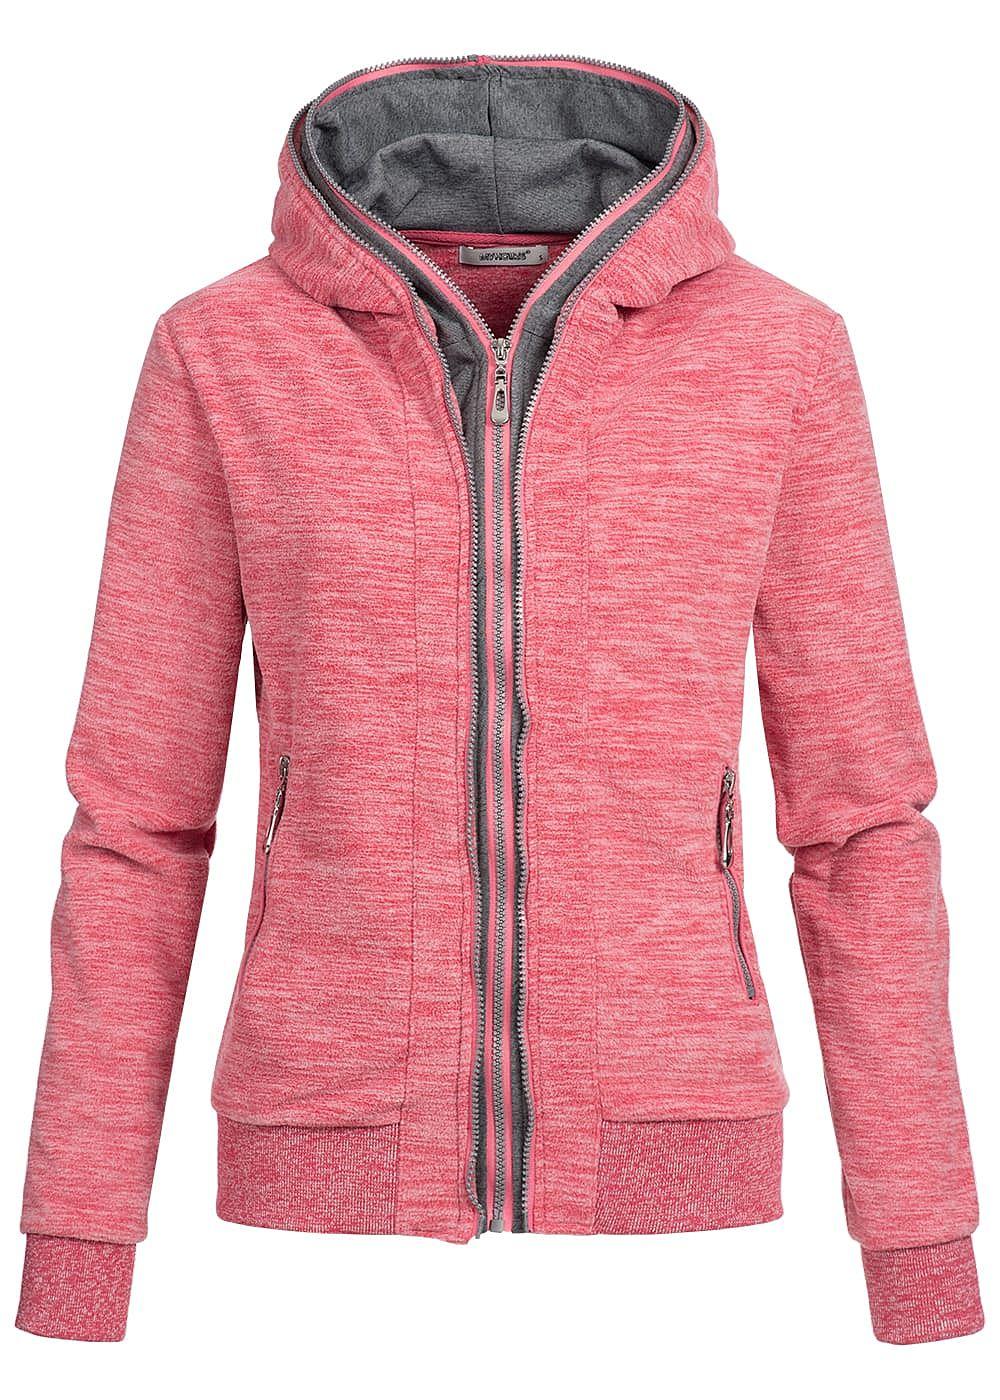 seventyseven lifestyle damen fleece zip hoodie kapuze 2. Black Bedroom Furniture Sets. Home Design Ideas